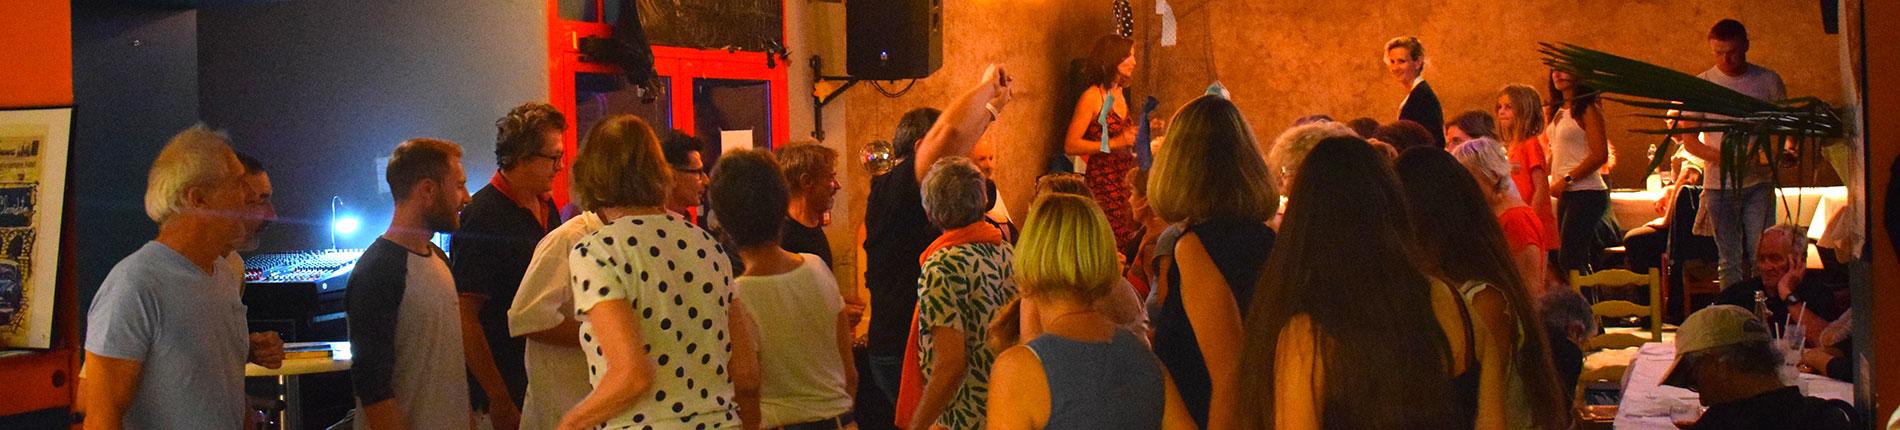 La Bigaille. Bar associatif et culturel. Marennes